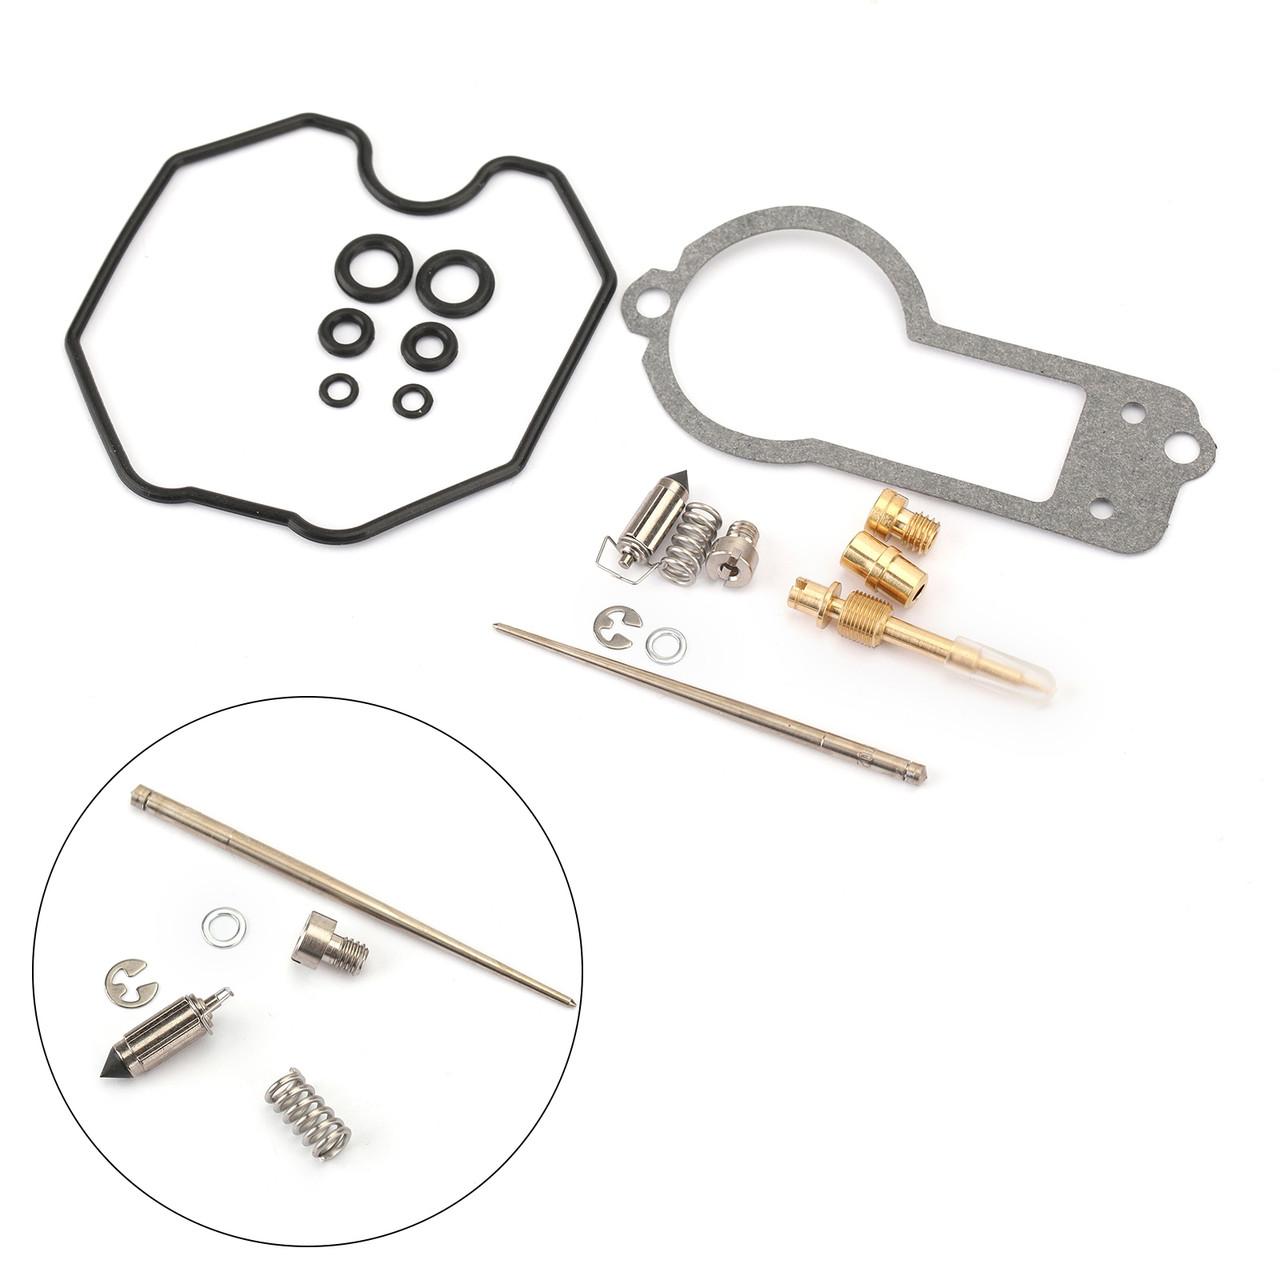 Carburetor Carb Repair Rebuild Kit For Honda Interceptor 700 VF700F 84-85 750 VF750F 84 700 VF700C 85-86 VF750F 83